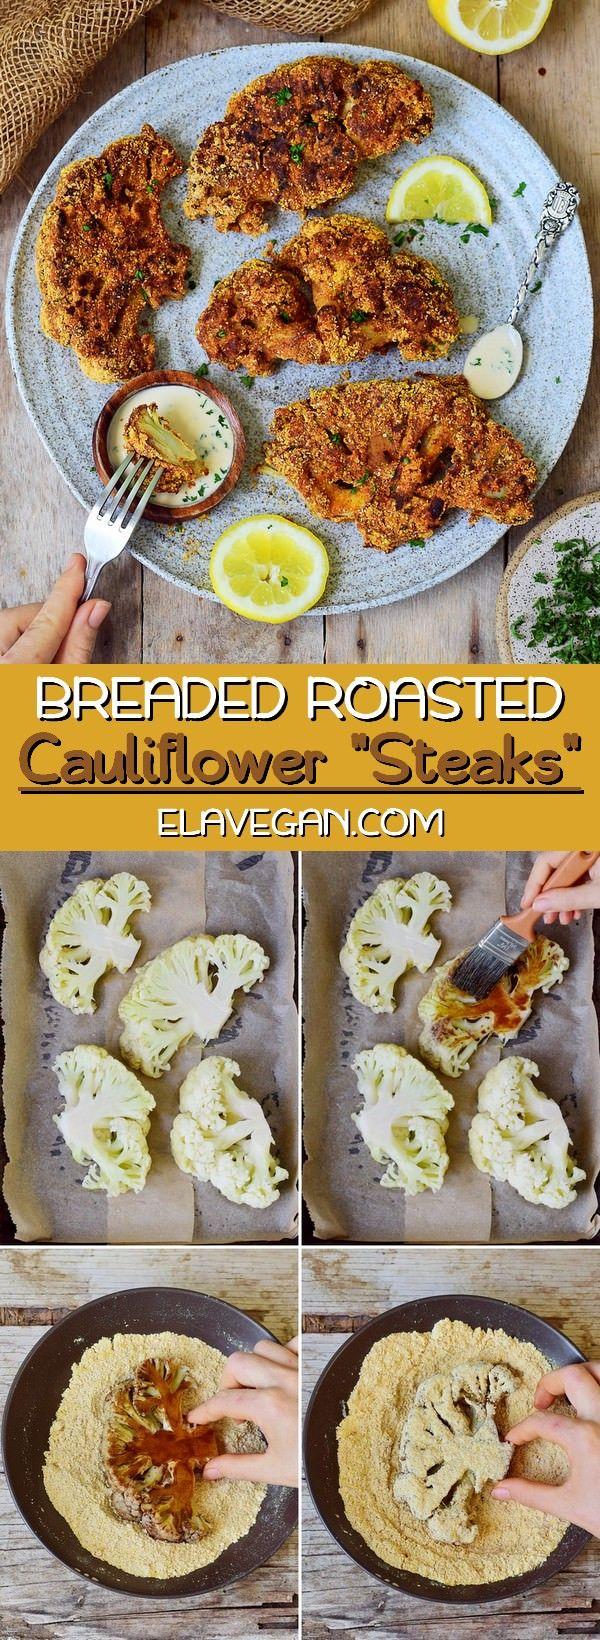 "Photo of Oven Roasted Cauliflower ""Steaks"""